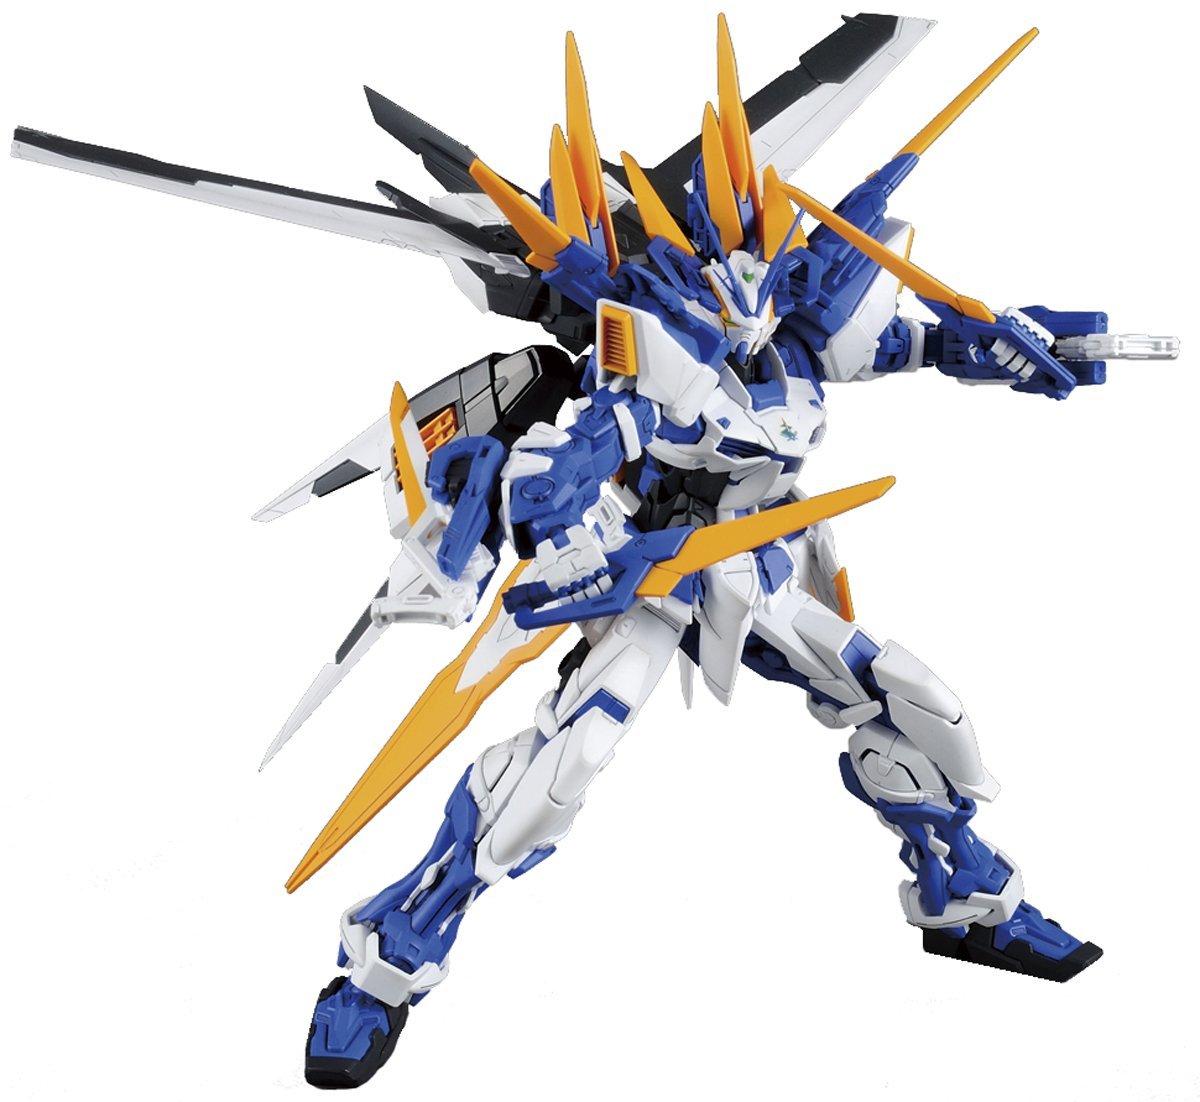 Bandai Hob MG Gundam Astray Blue Frame D Action Figure, Fast shipping,Brand STAR USA by